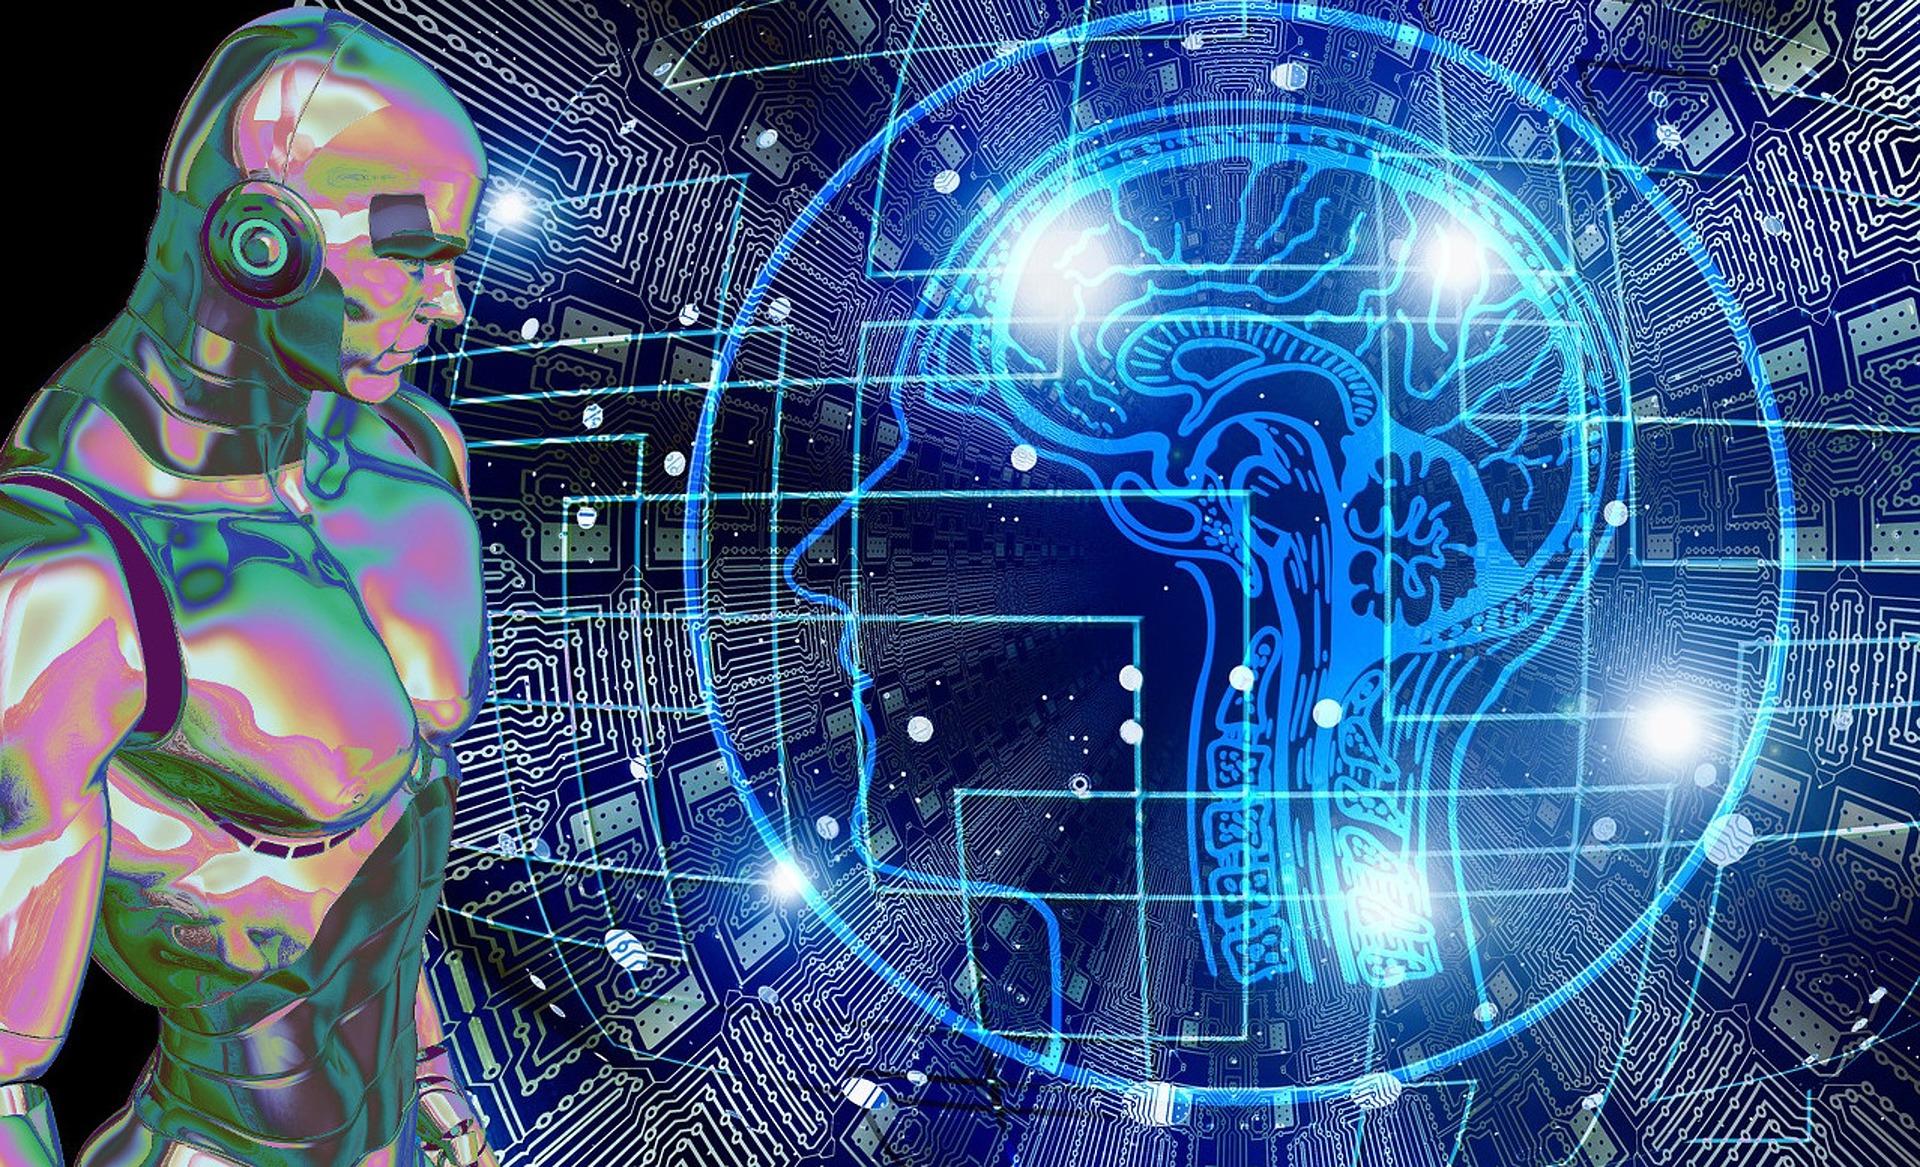 Bringing Artificial Intelligence to schools through entrepreneurship